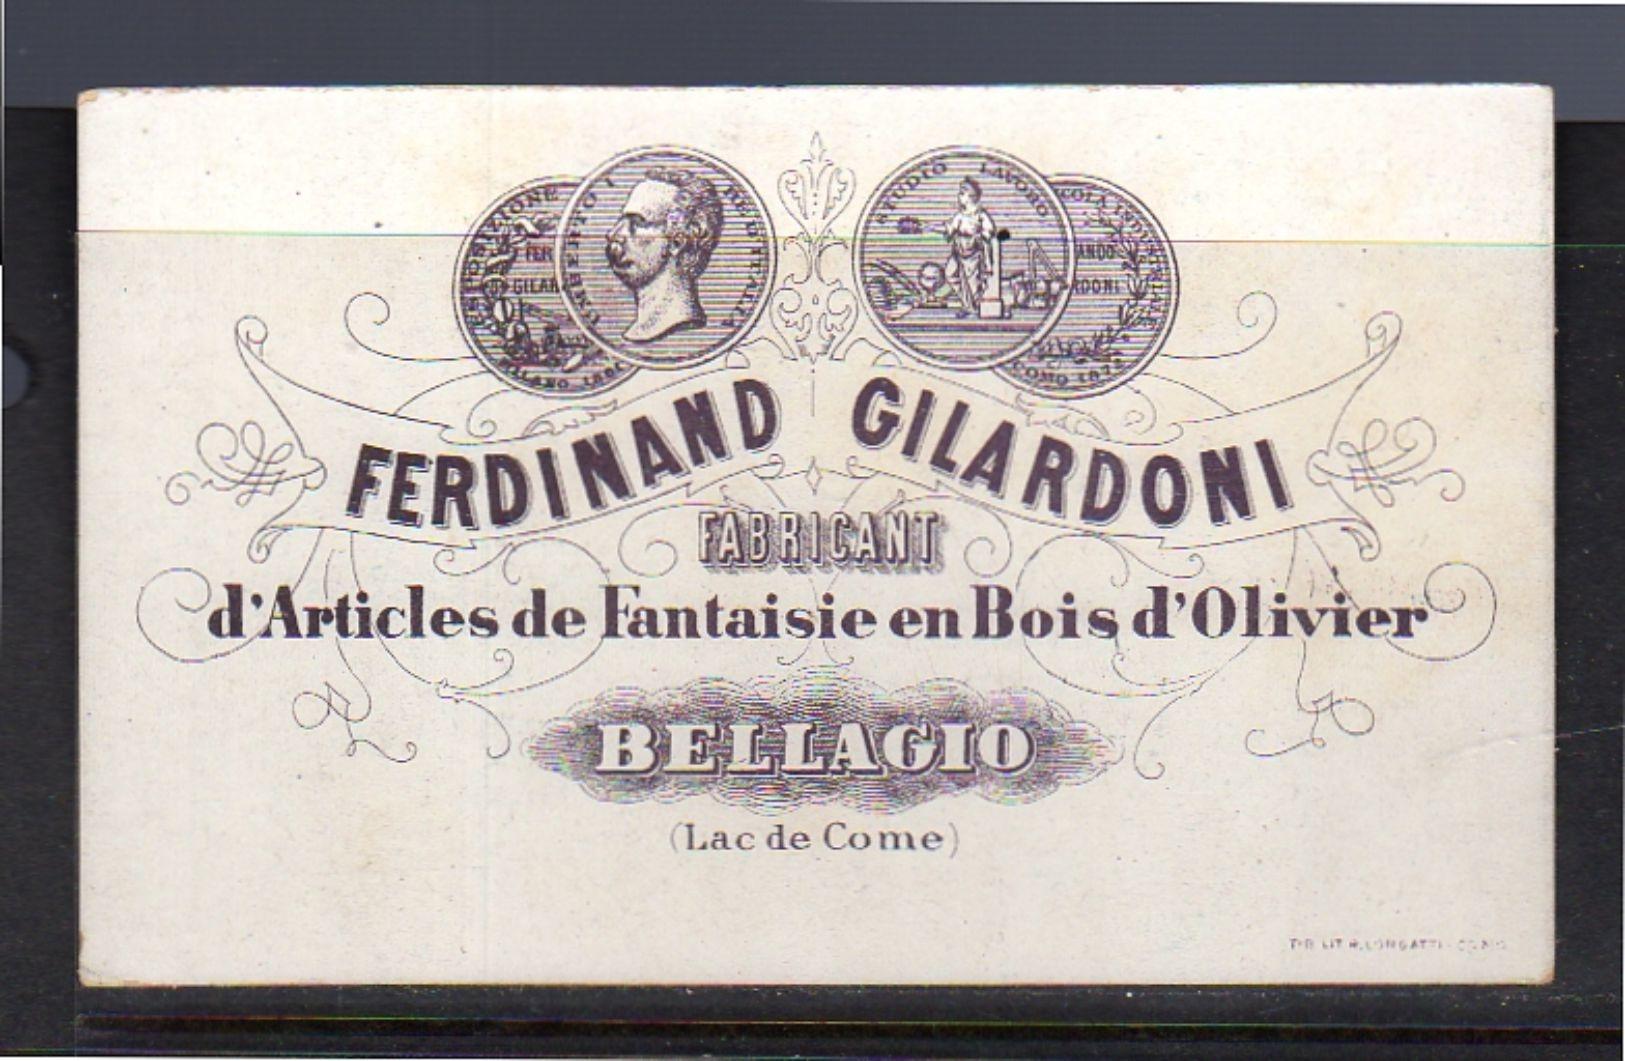 Pension BELLAGIO Ferdinand Gilardoni Bois D'olivier Lac De Come ± 1900  12 X 7½ Cm (k22-11) - Advertising